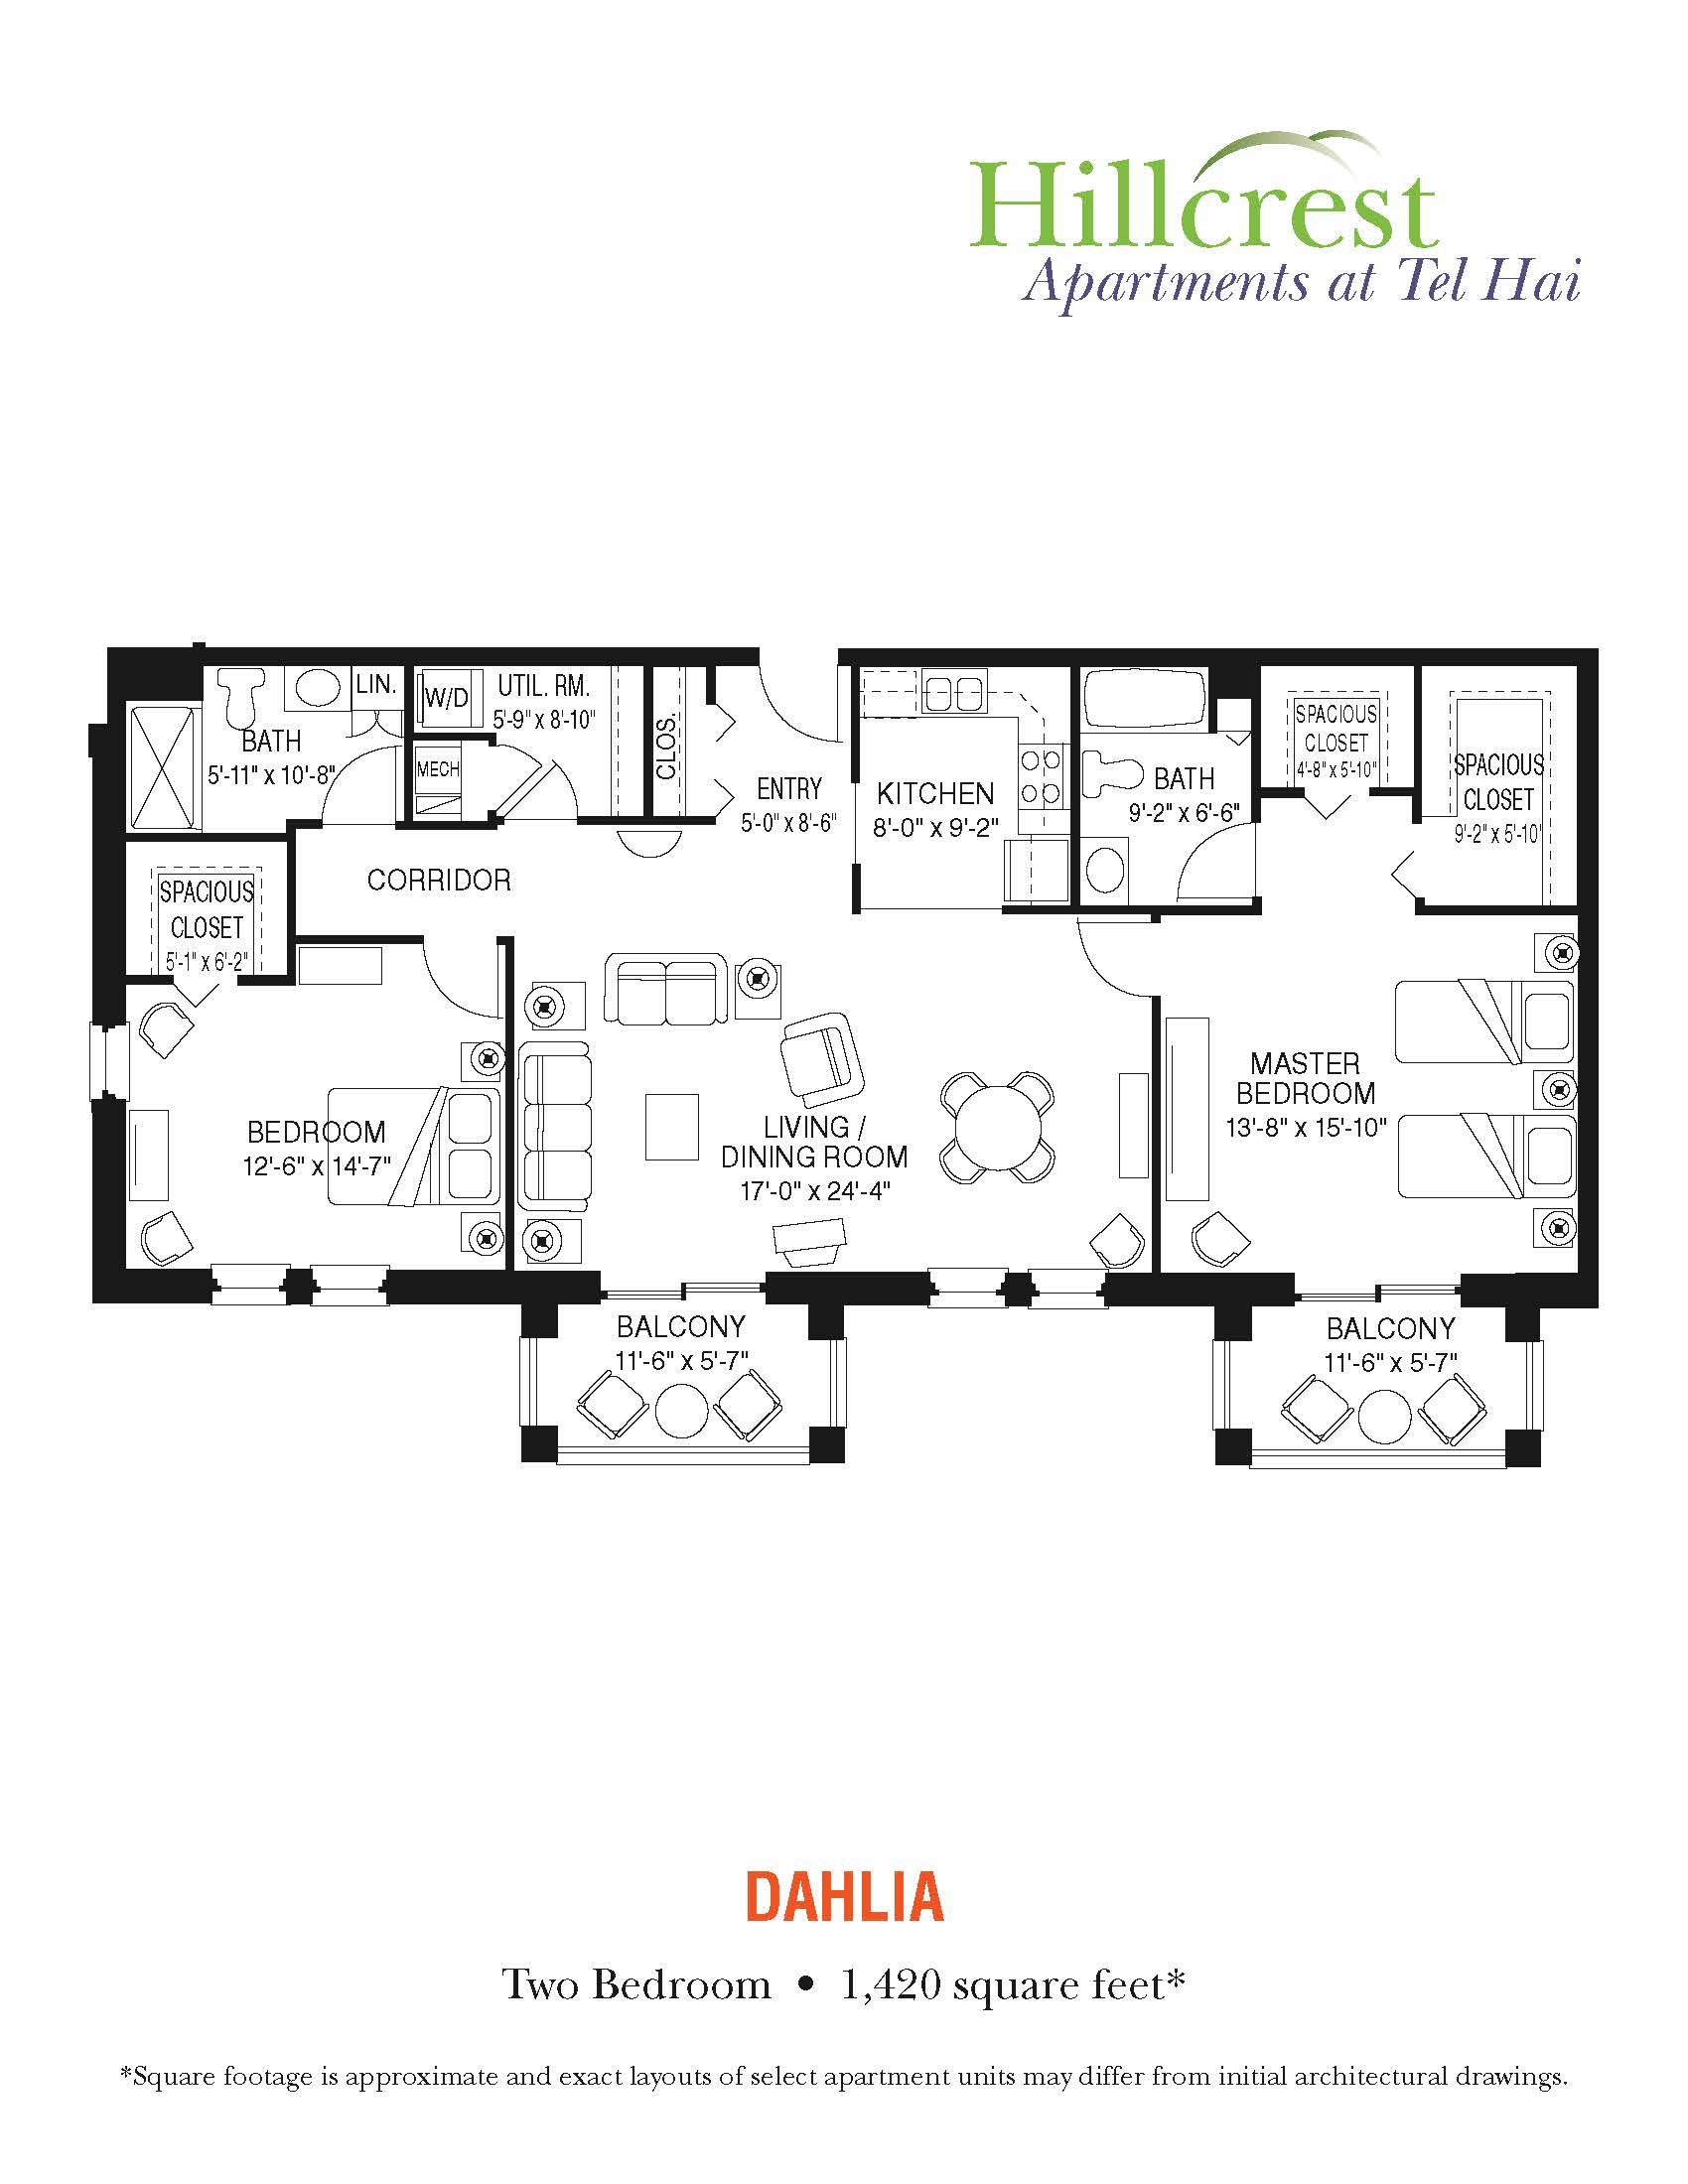 Dahlia Apartment at Tel Hai